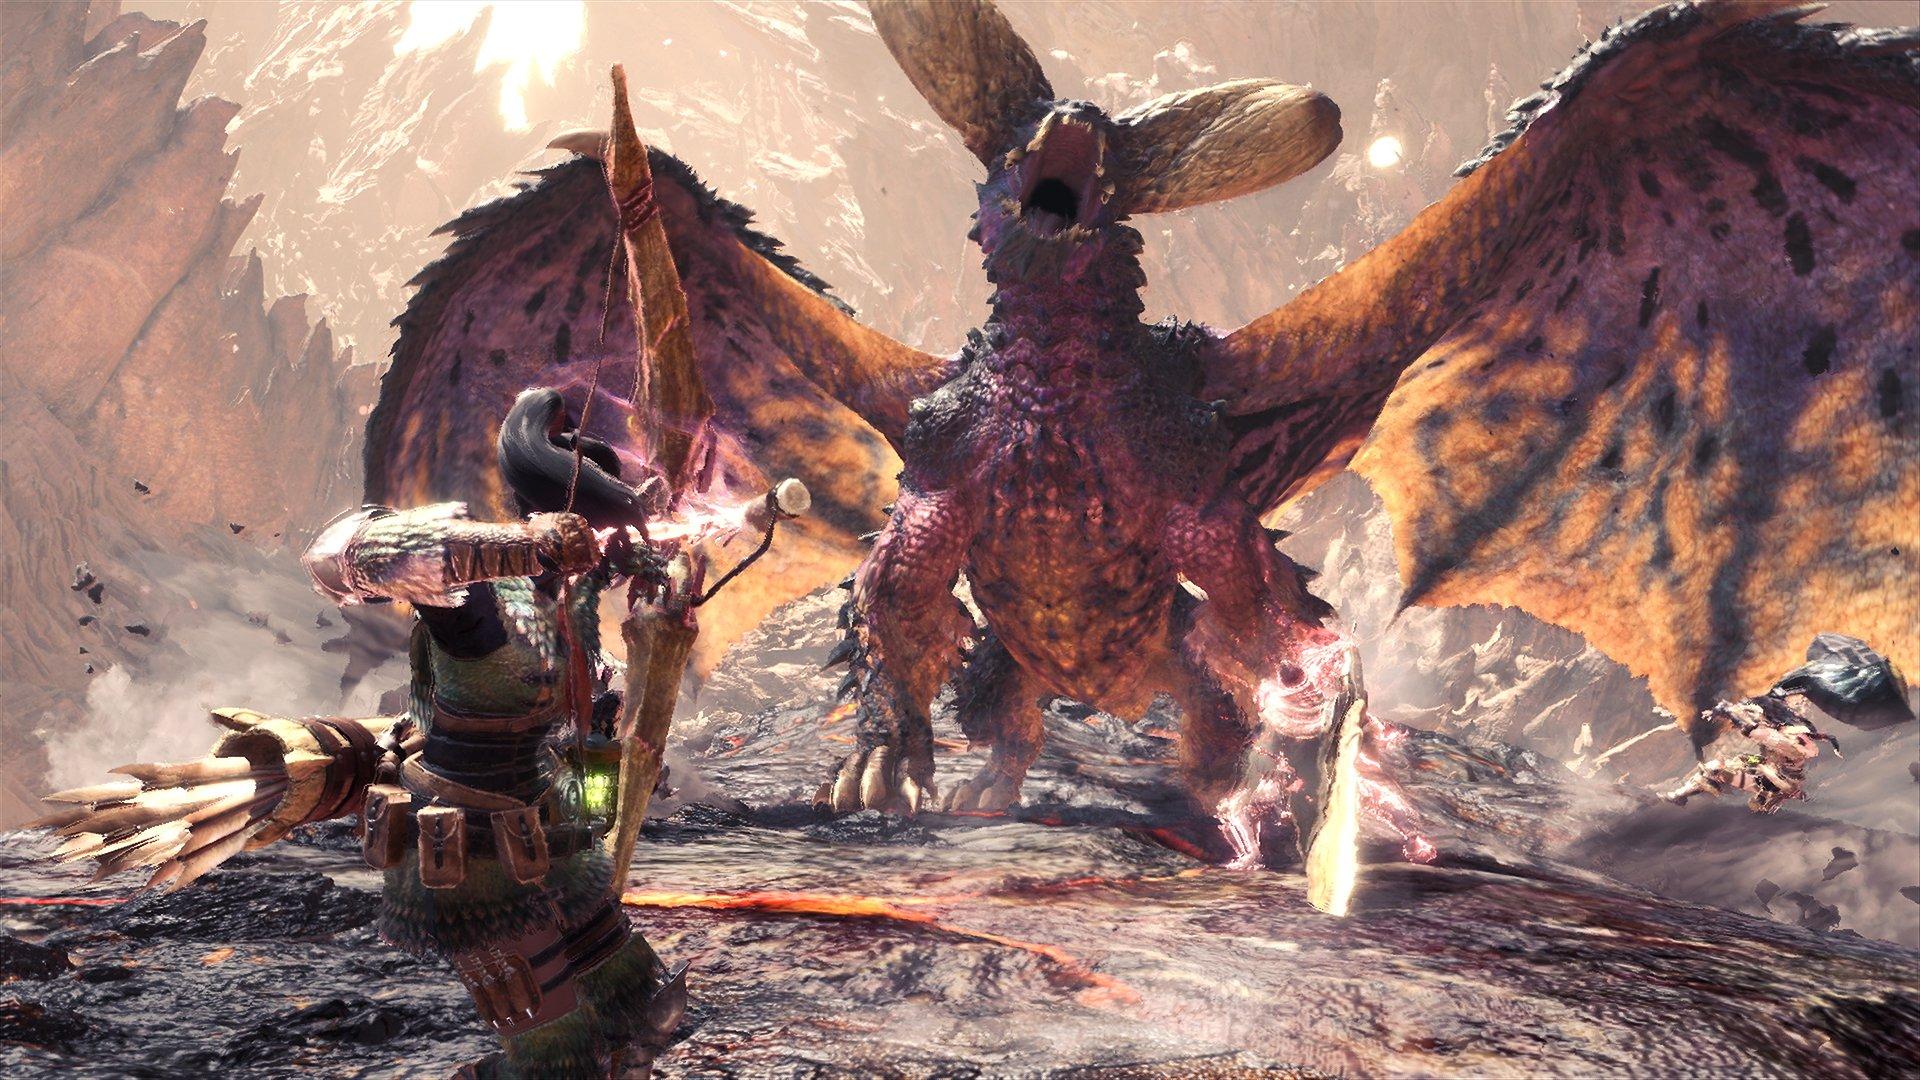 How to defeat Nergigante in Monster Hunter World | AllGamers